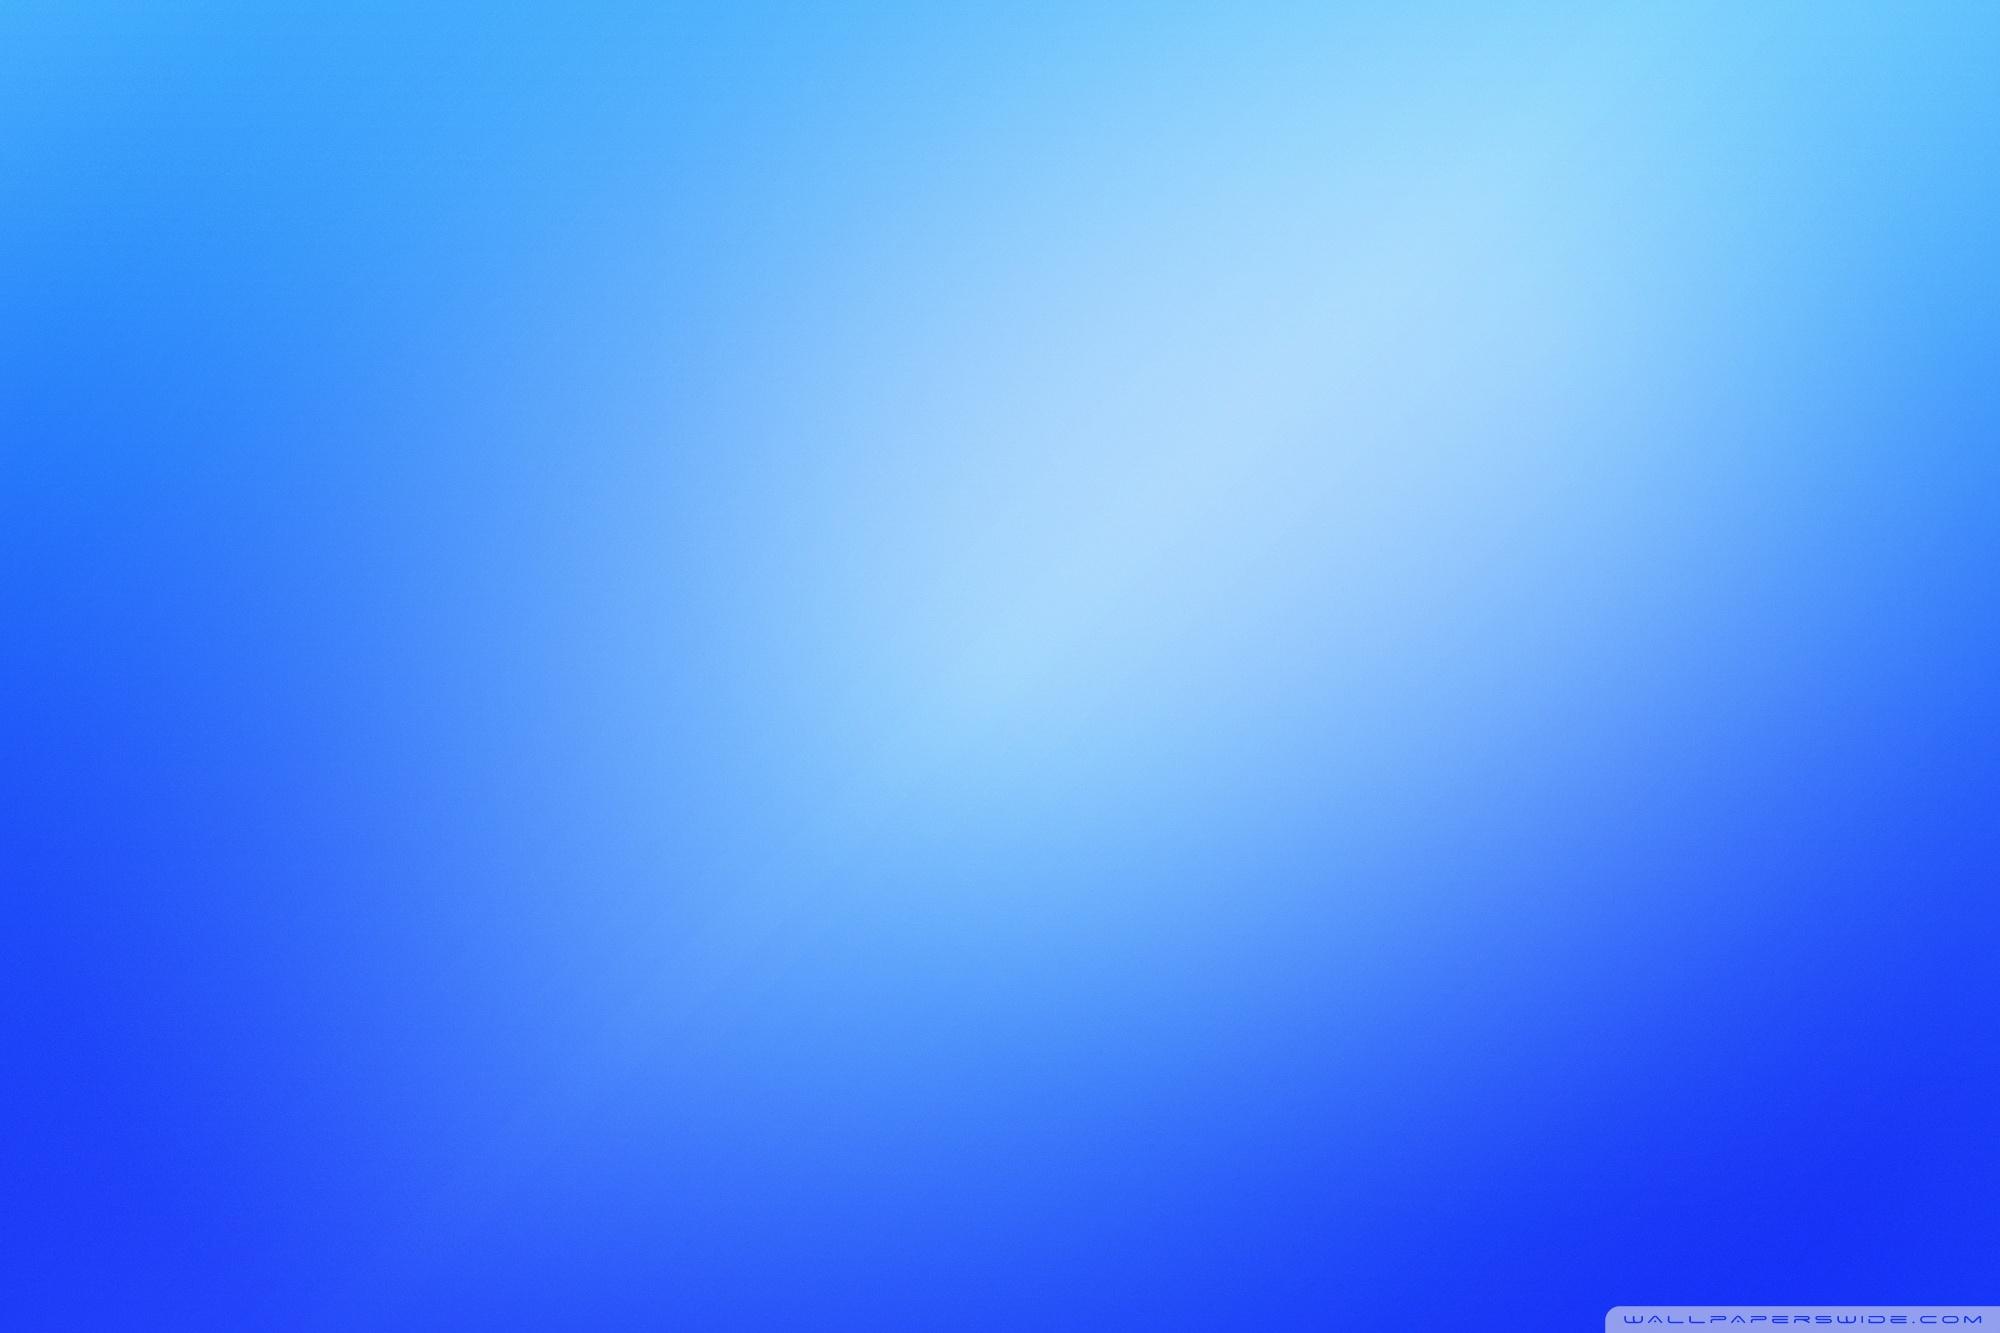 Free Download Blurry Blue Background I Hd Desktop Wallpaper